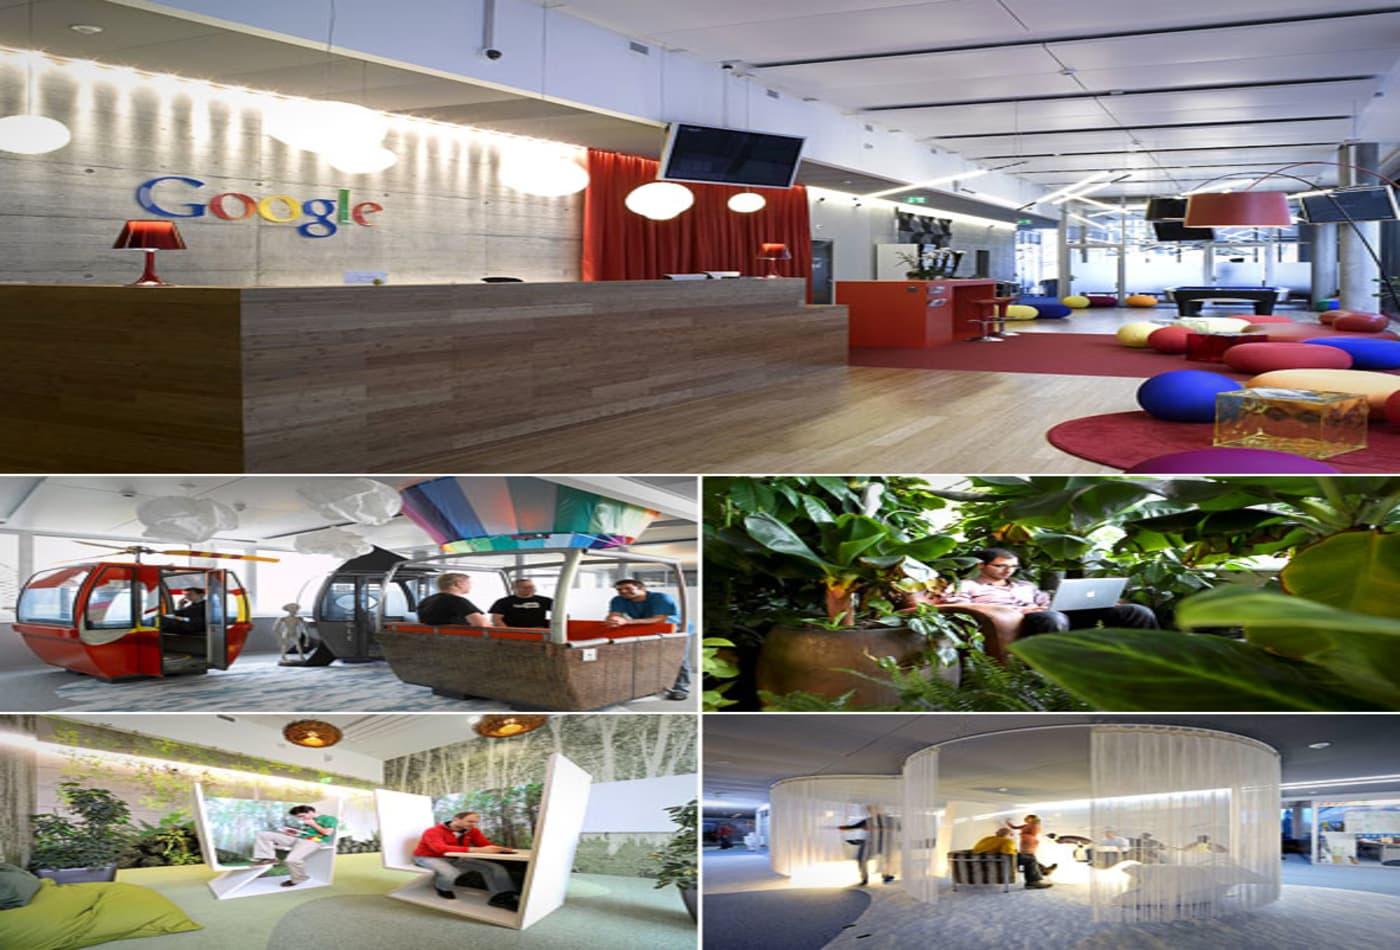 Google-Zurich-Coolest-Corporate-Headquarters-CNBC.jpg